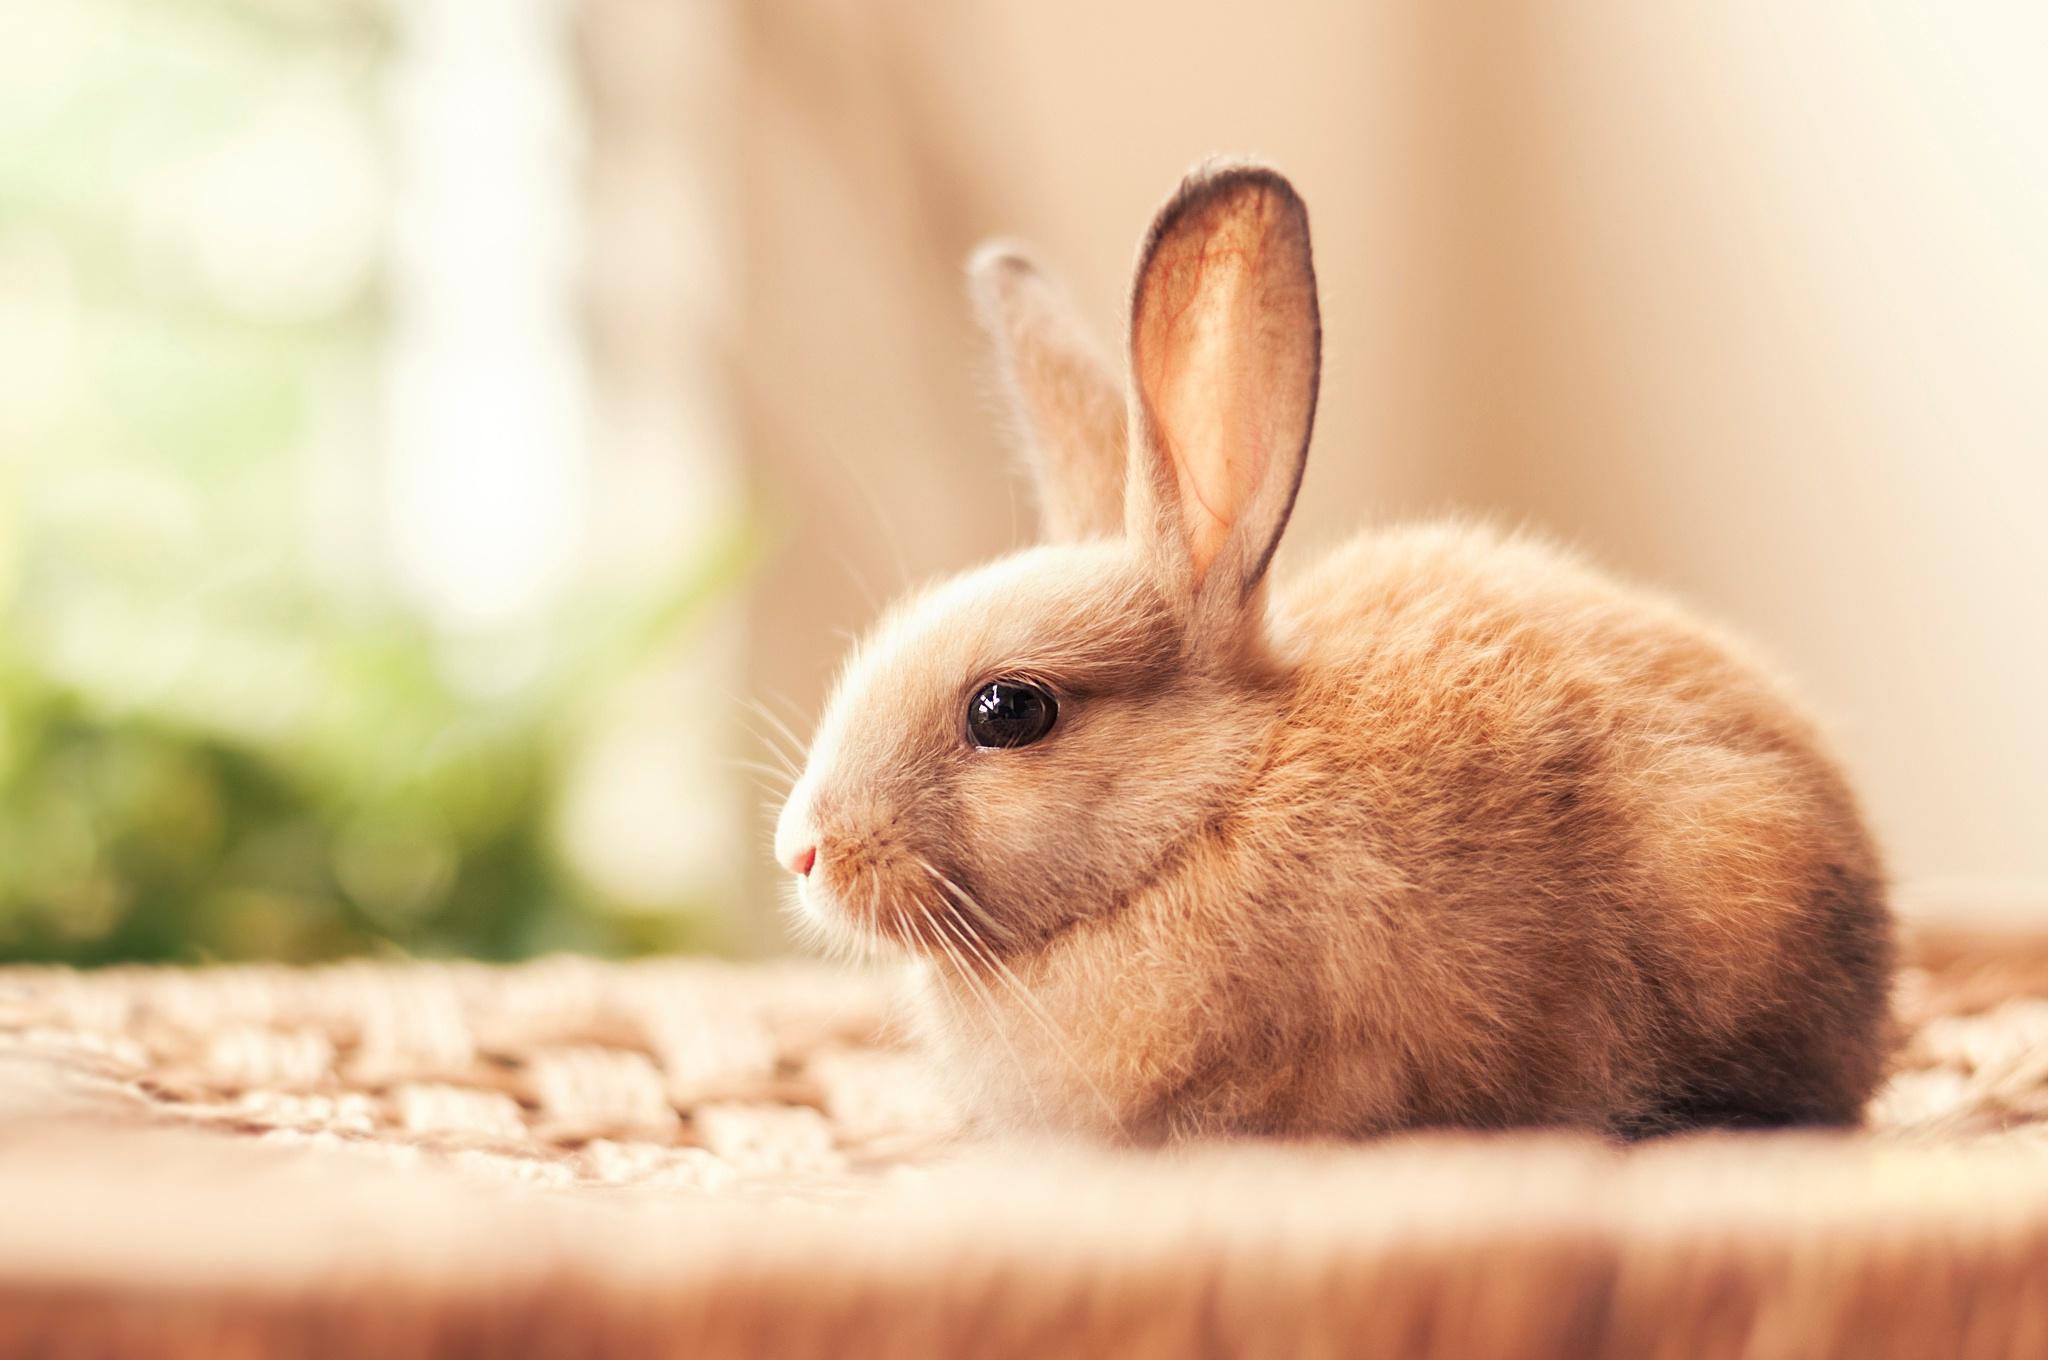 Описание кролика   Мой Тамагочи